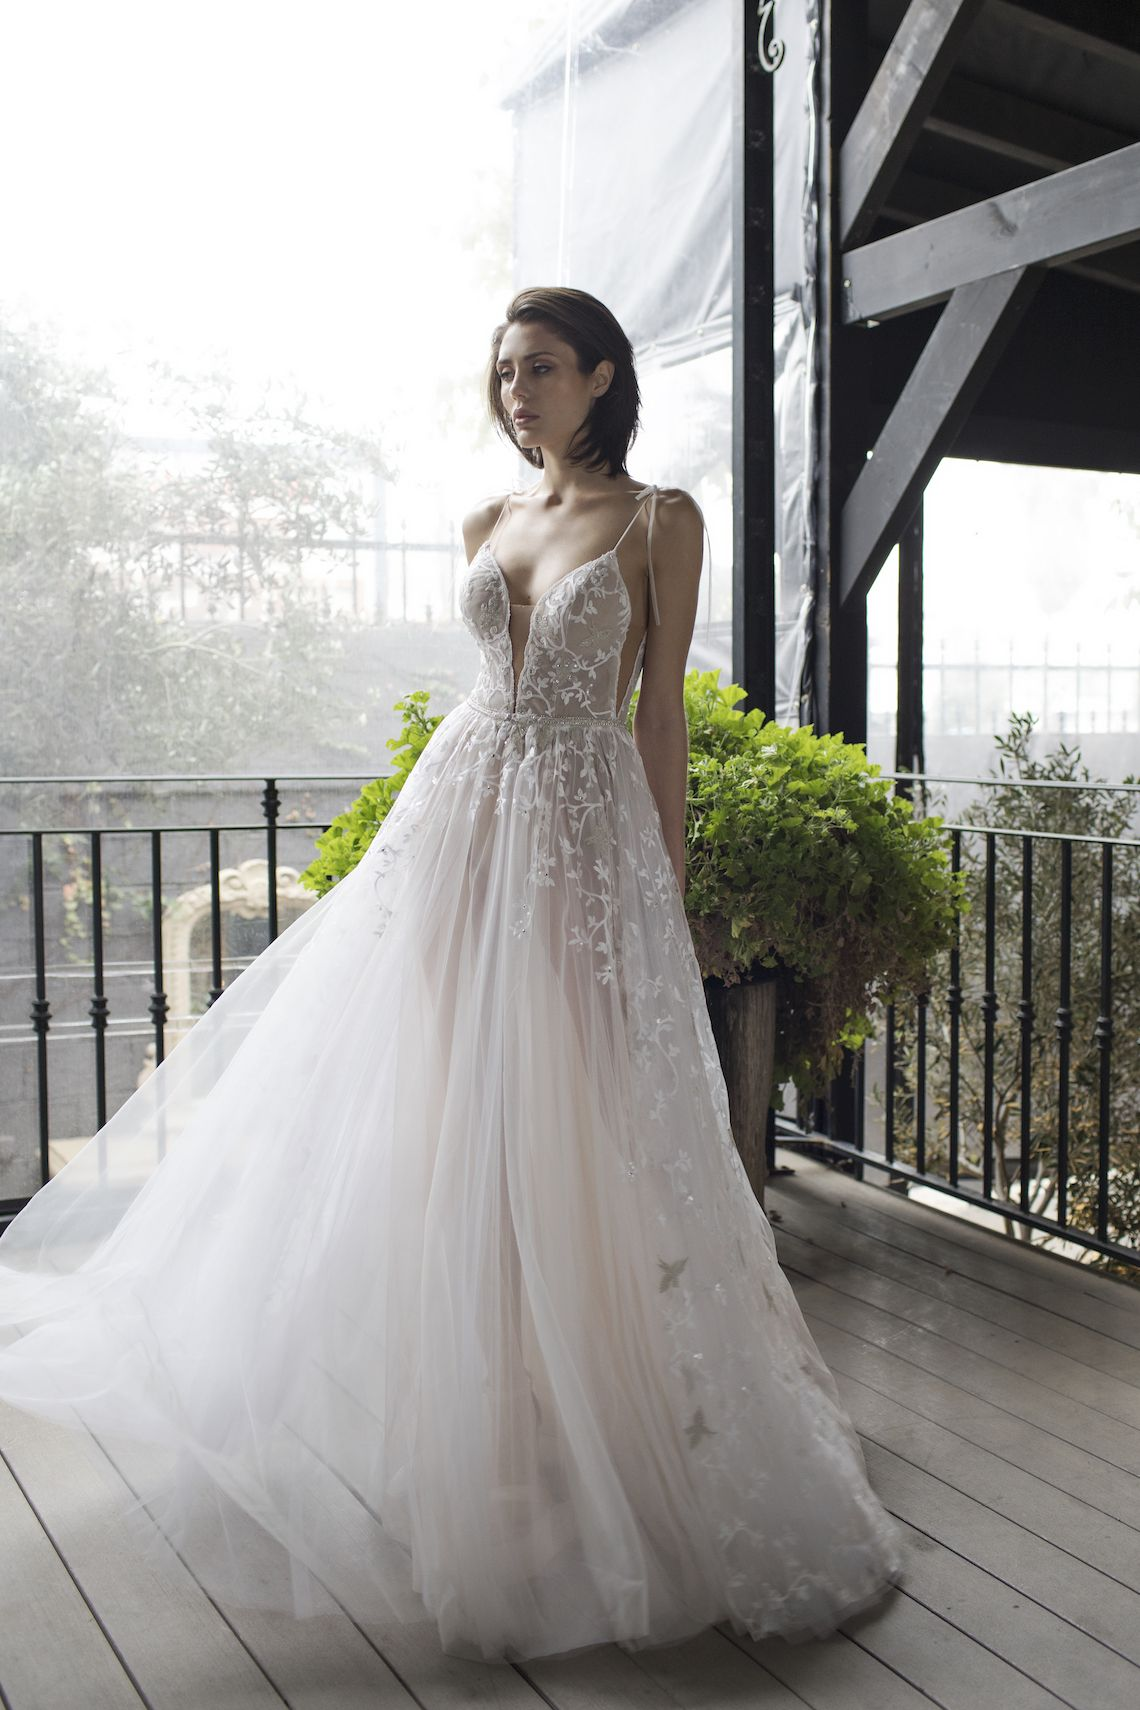 Florence riki dalal wedding dress collection new